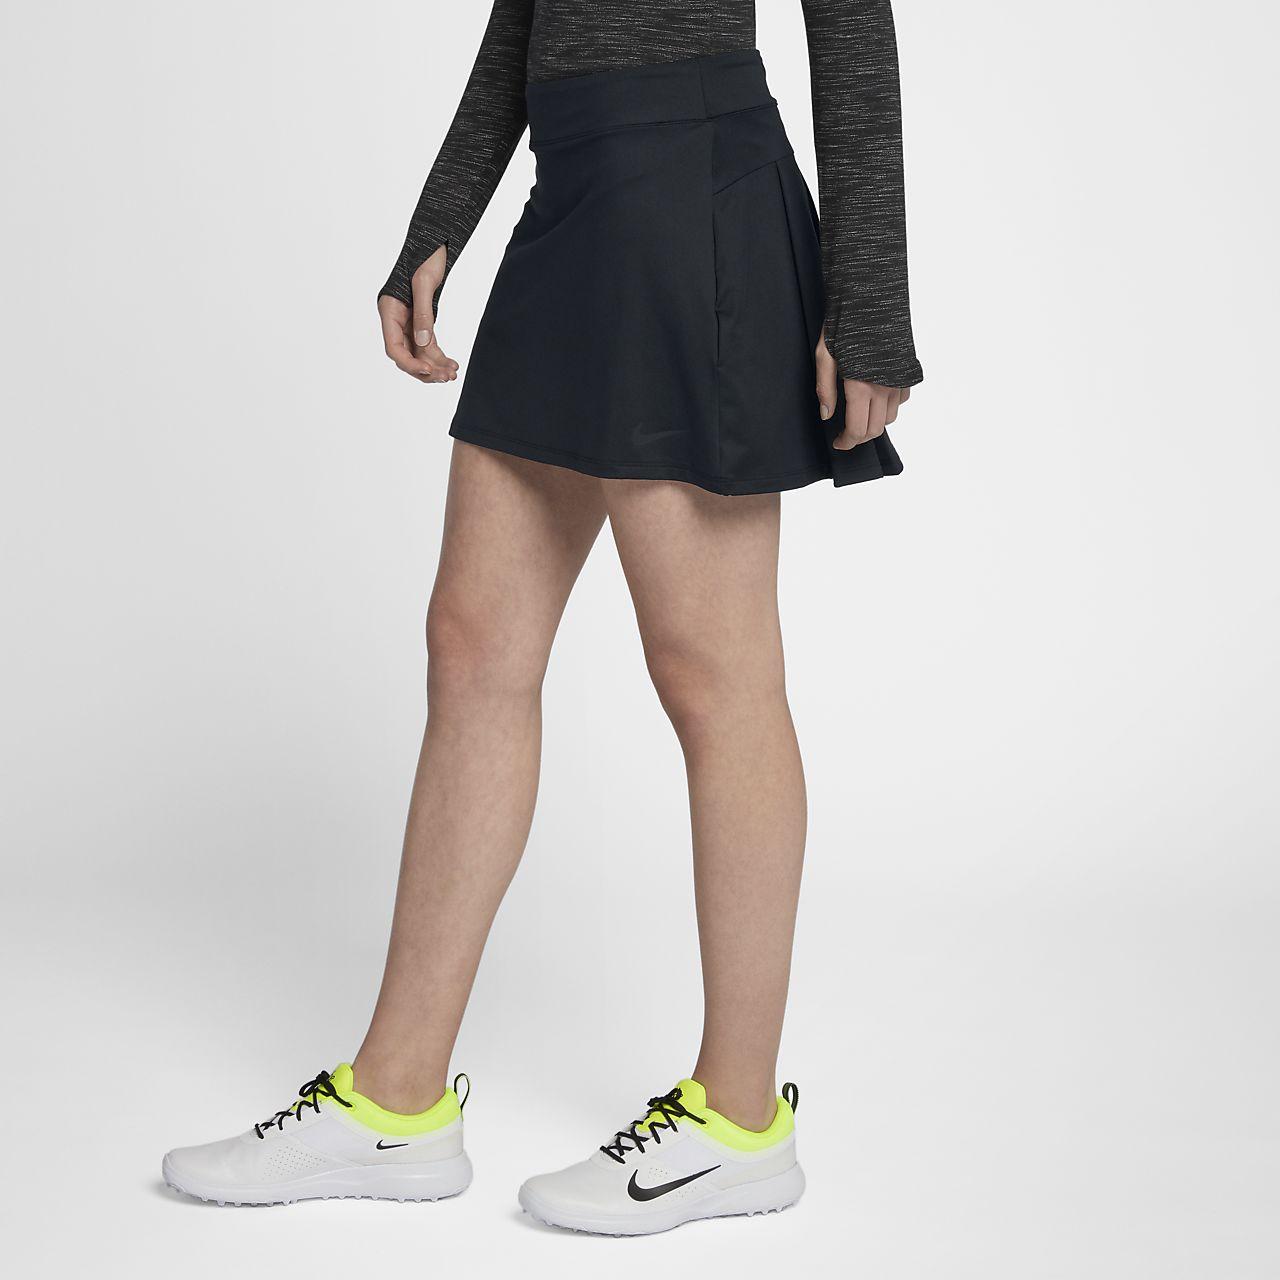 promo code 61058 af016 Nike Womens Tech Golf Skort